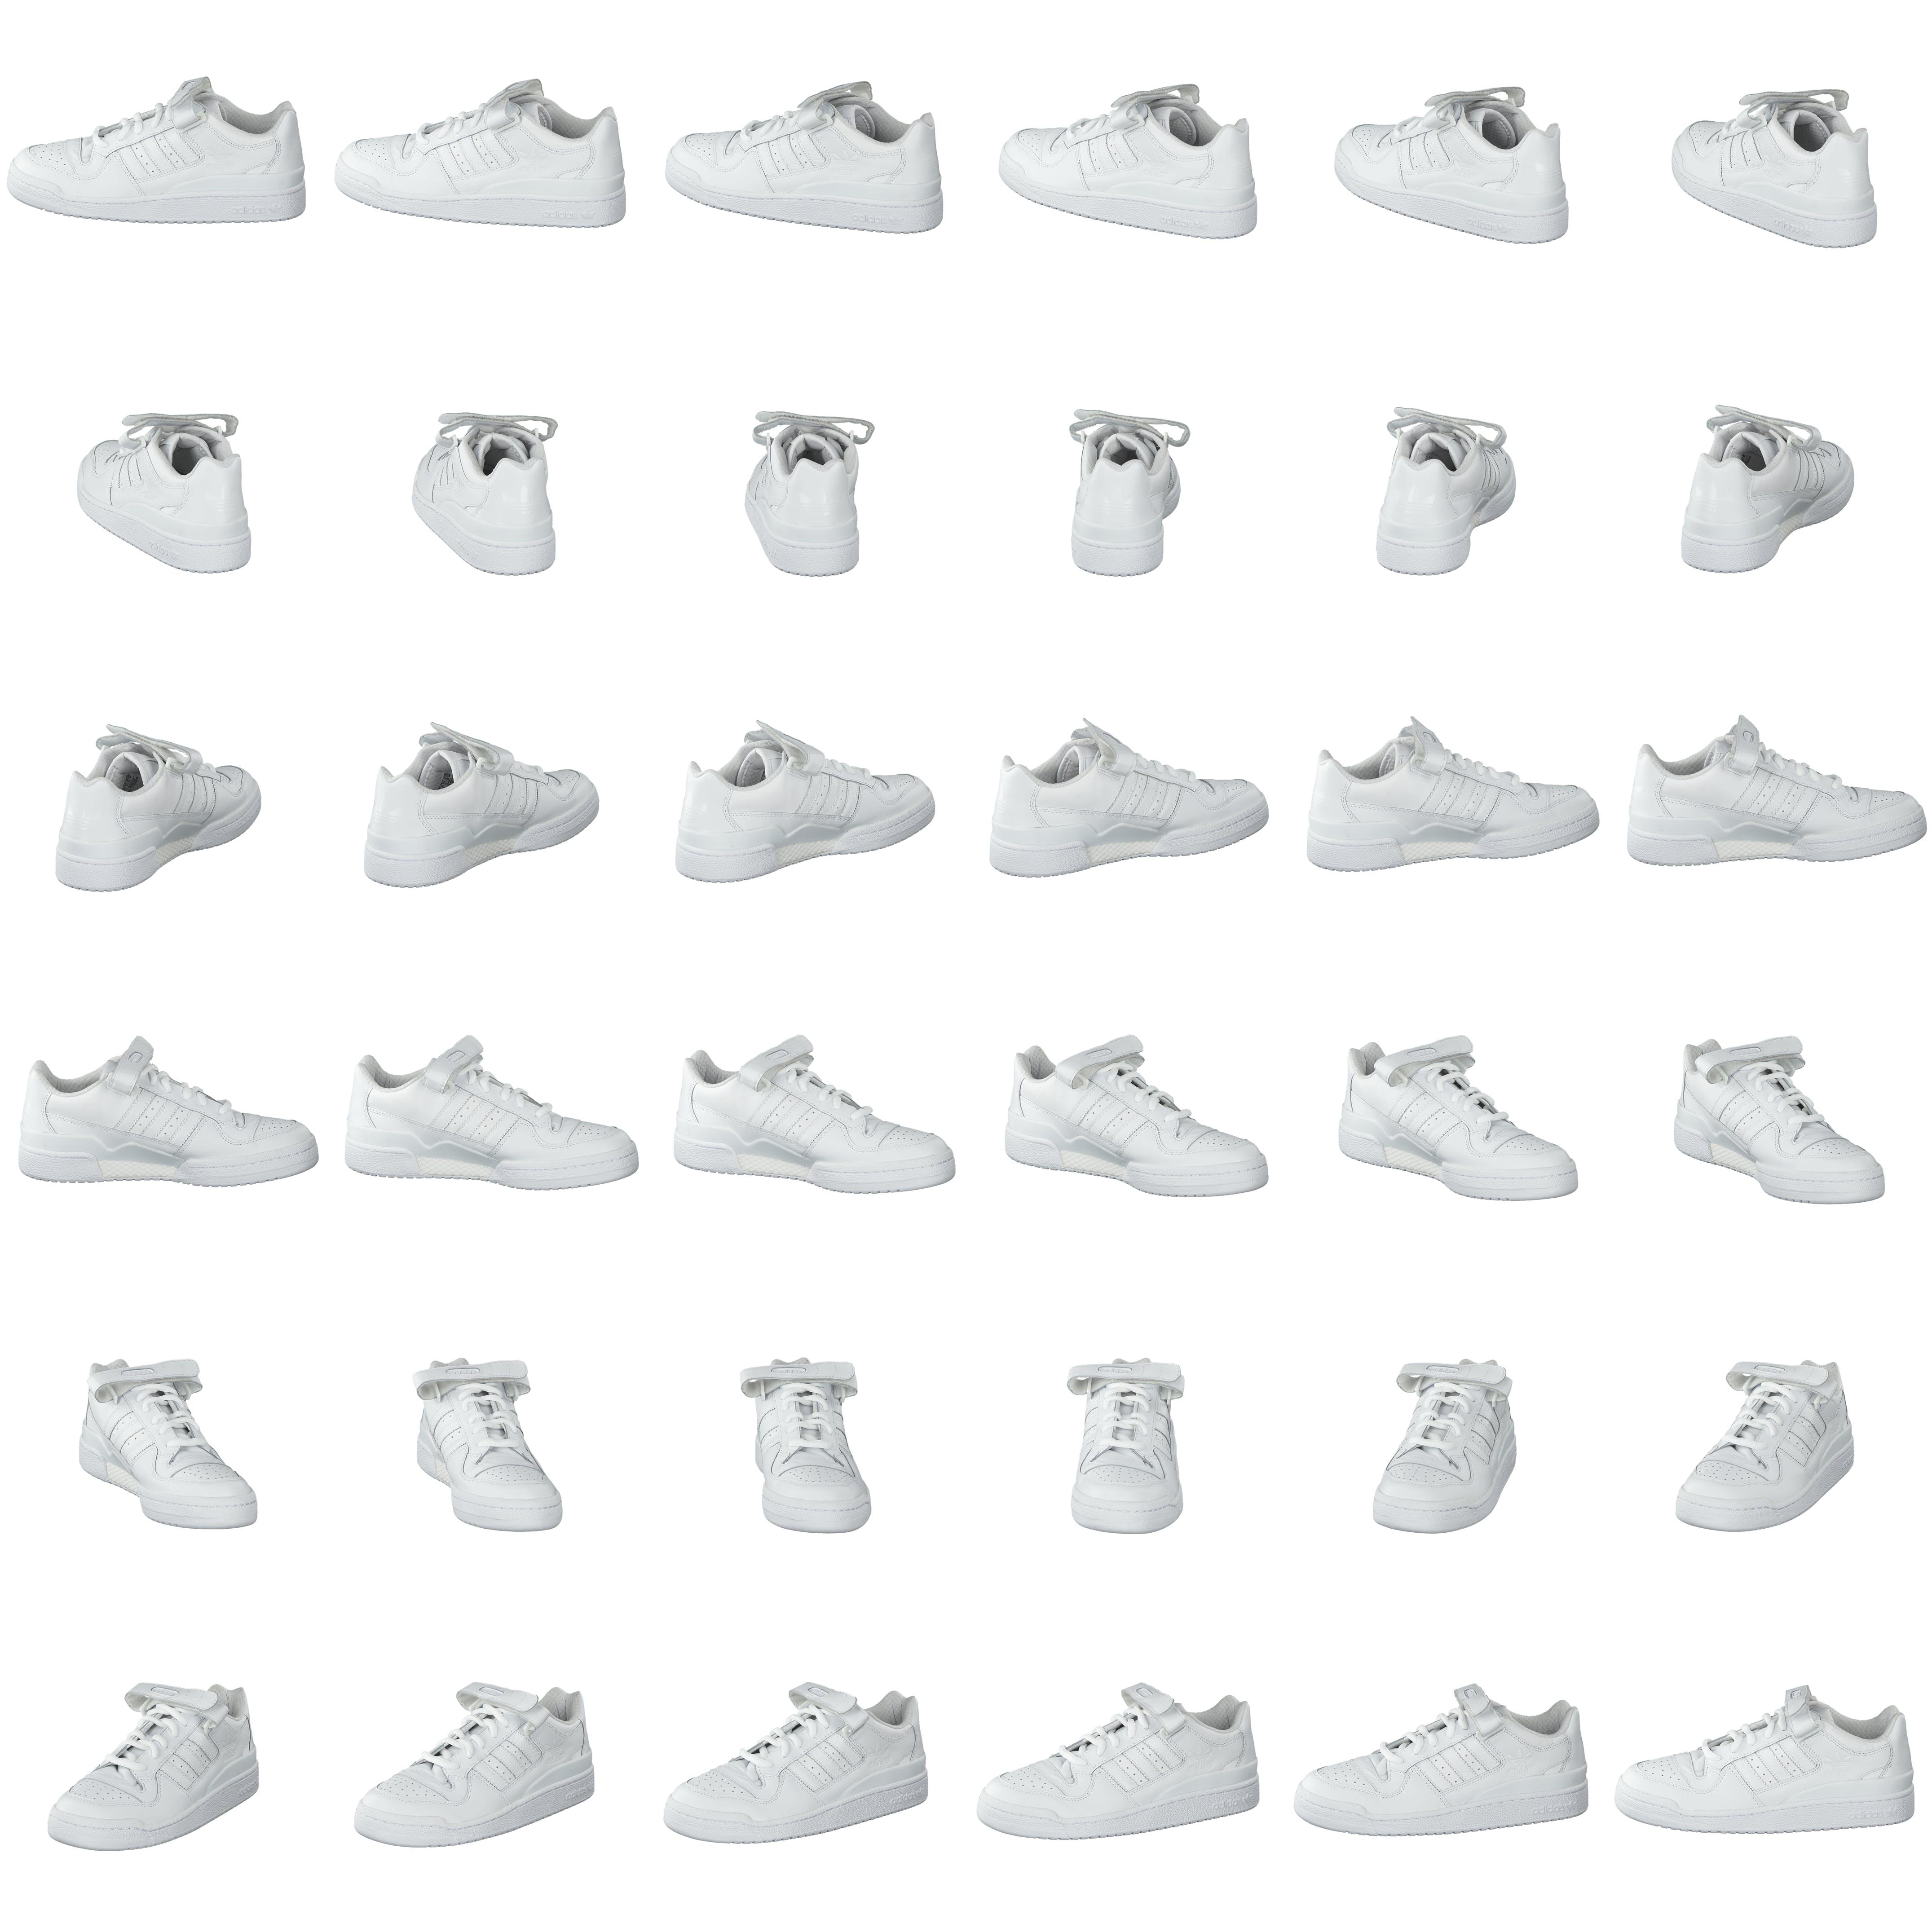 promo code a1810 cdca9 germany kjøp adidas originals forum lo rs ftwr white hvit sko online  footway.no f8f4e